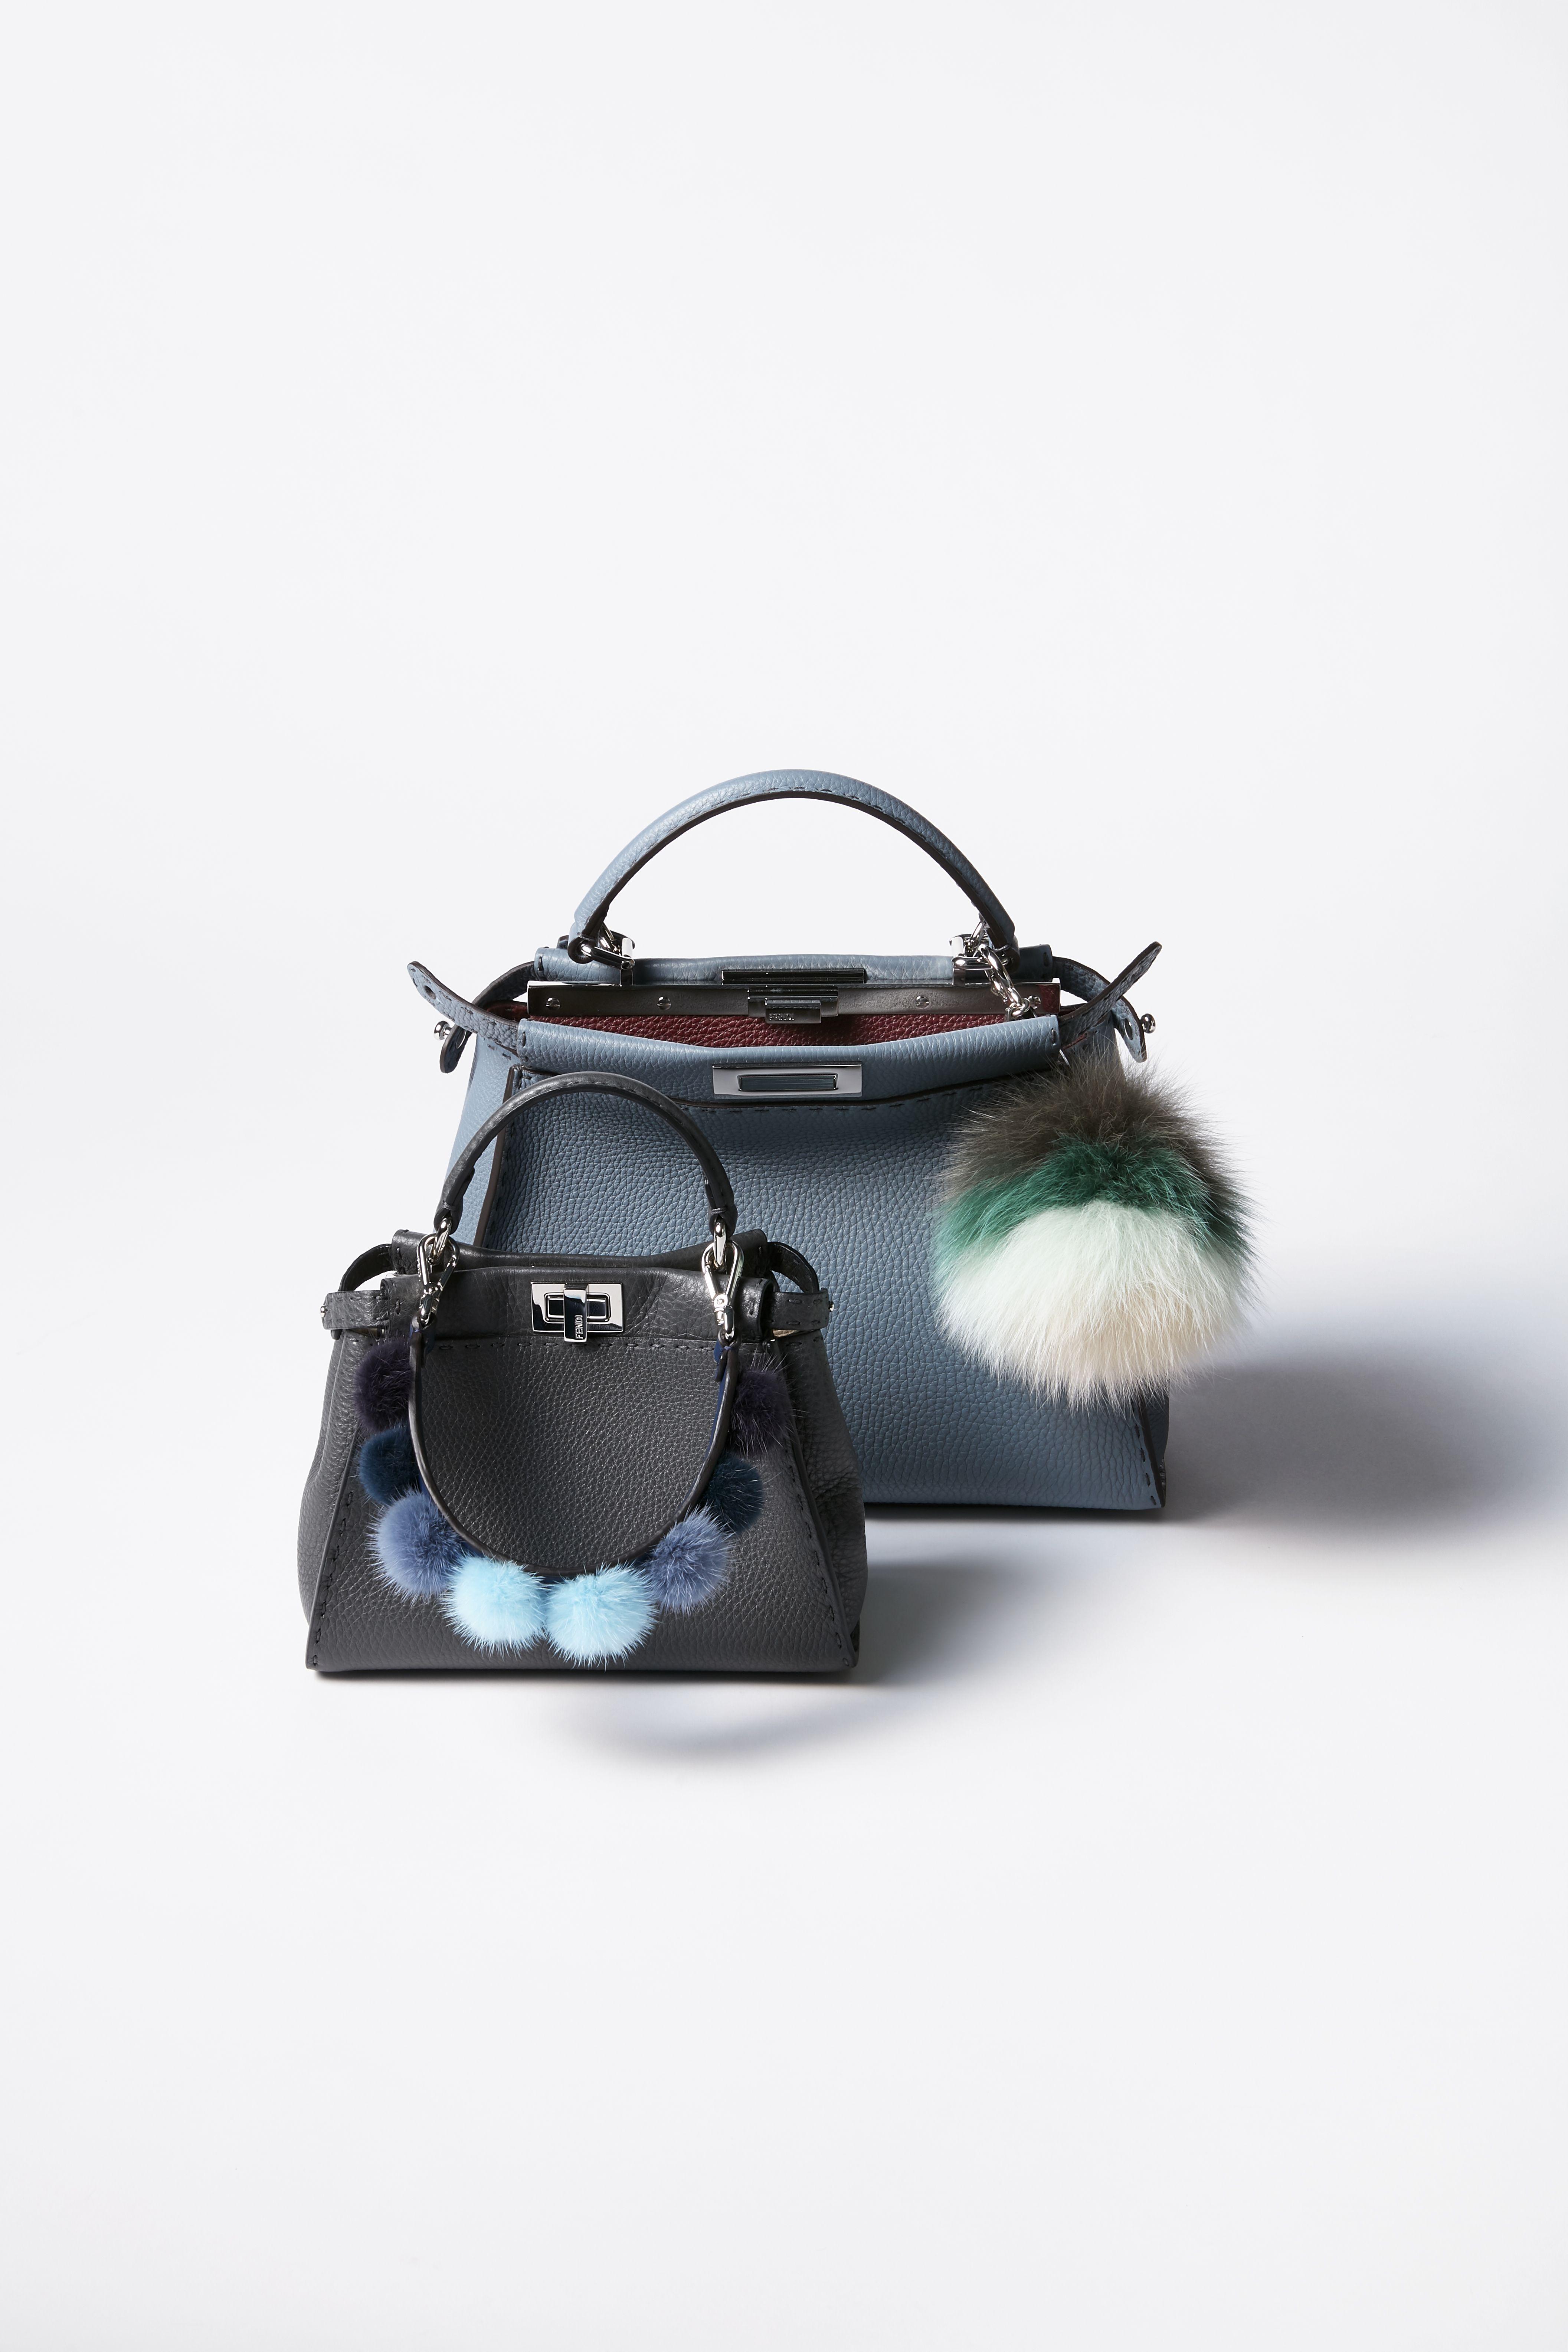 476830cfac6a Fendi Peekaboo Selleria with Bag Charm and Strap You. Photographed by Toru  Oshima for Signature Magazine Japan